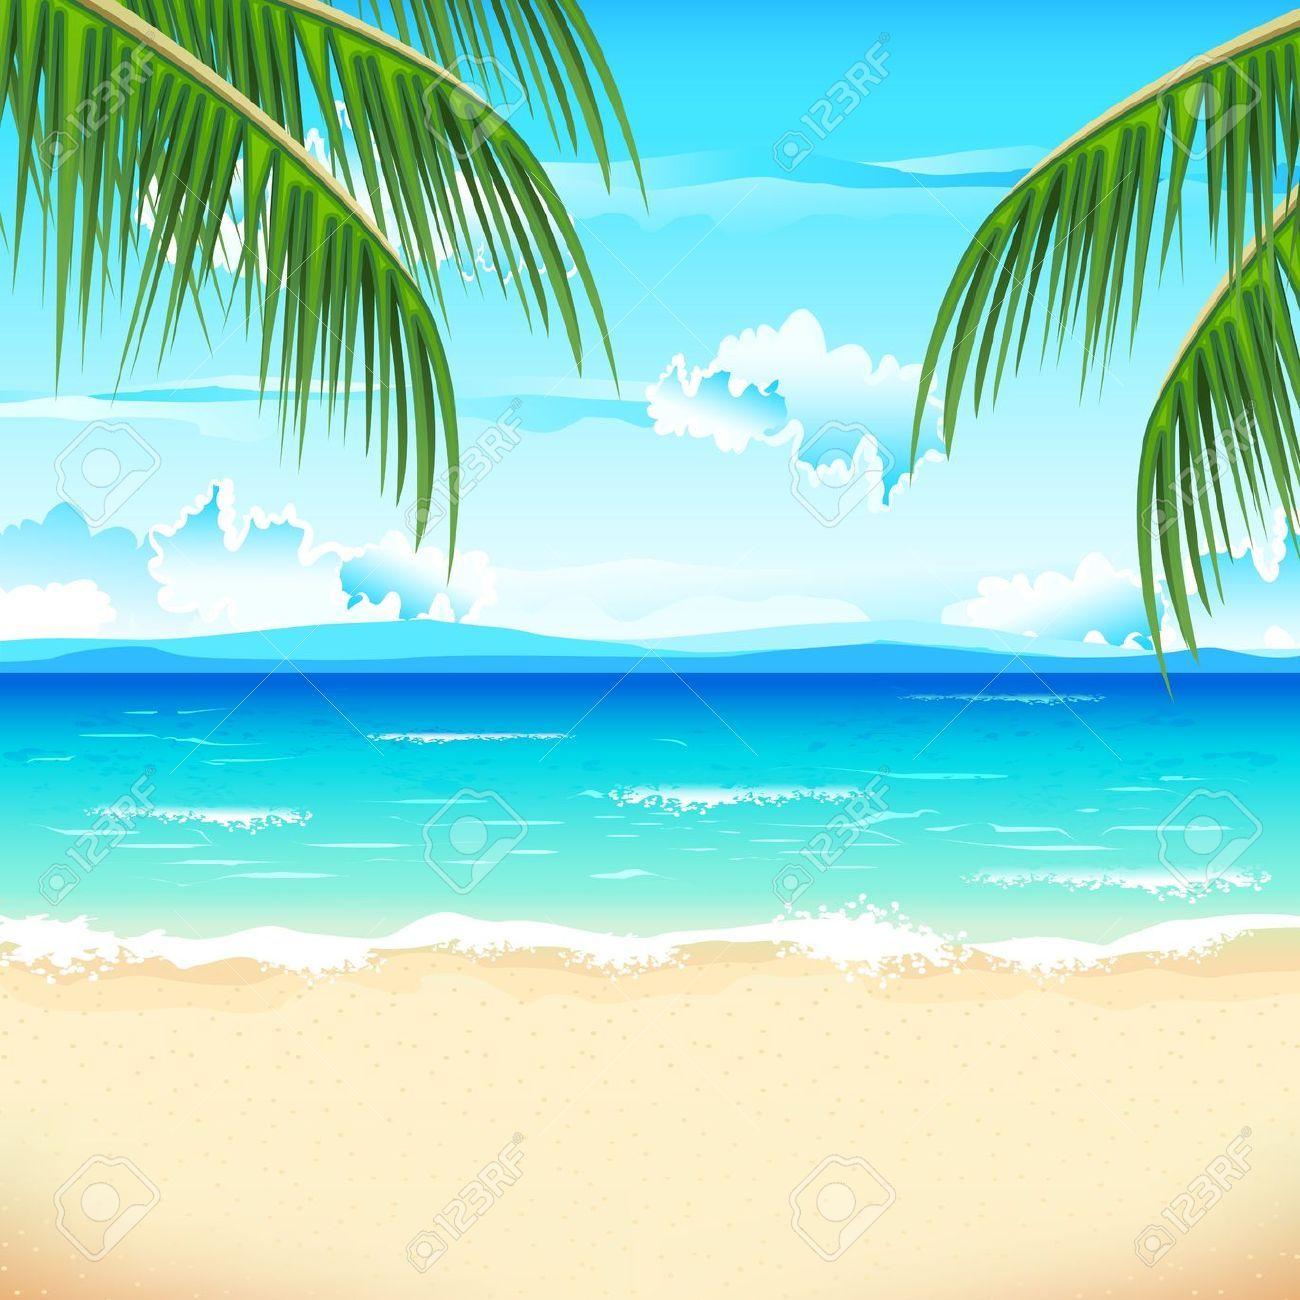 The prices for stock. Beach clipart beach scene